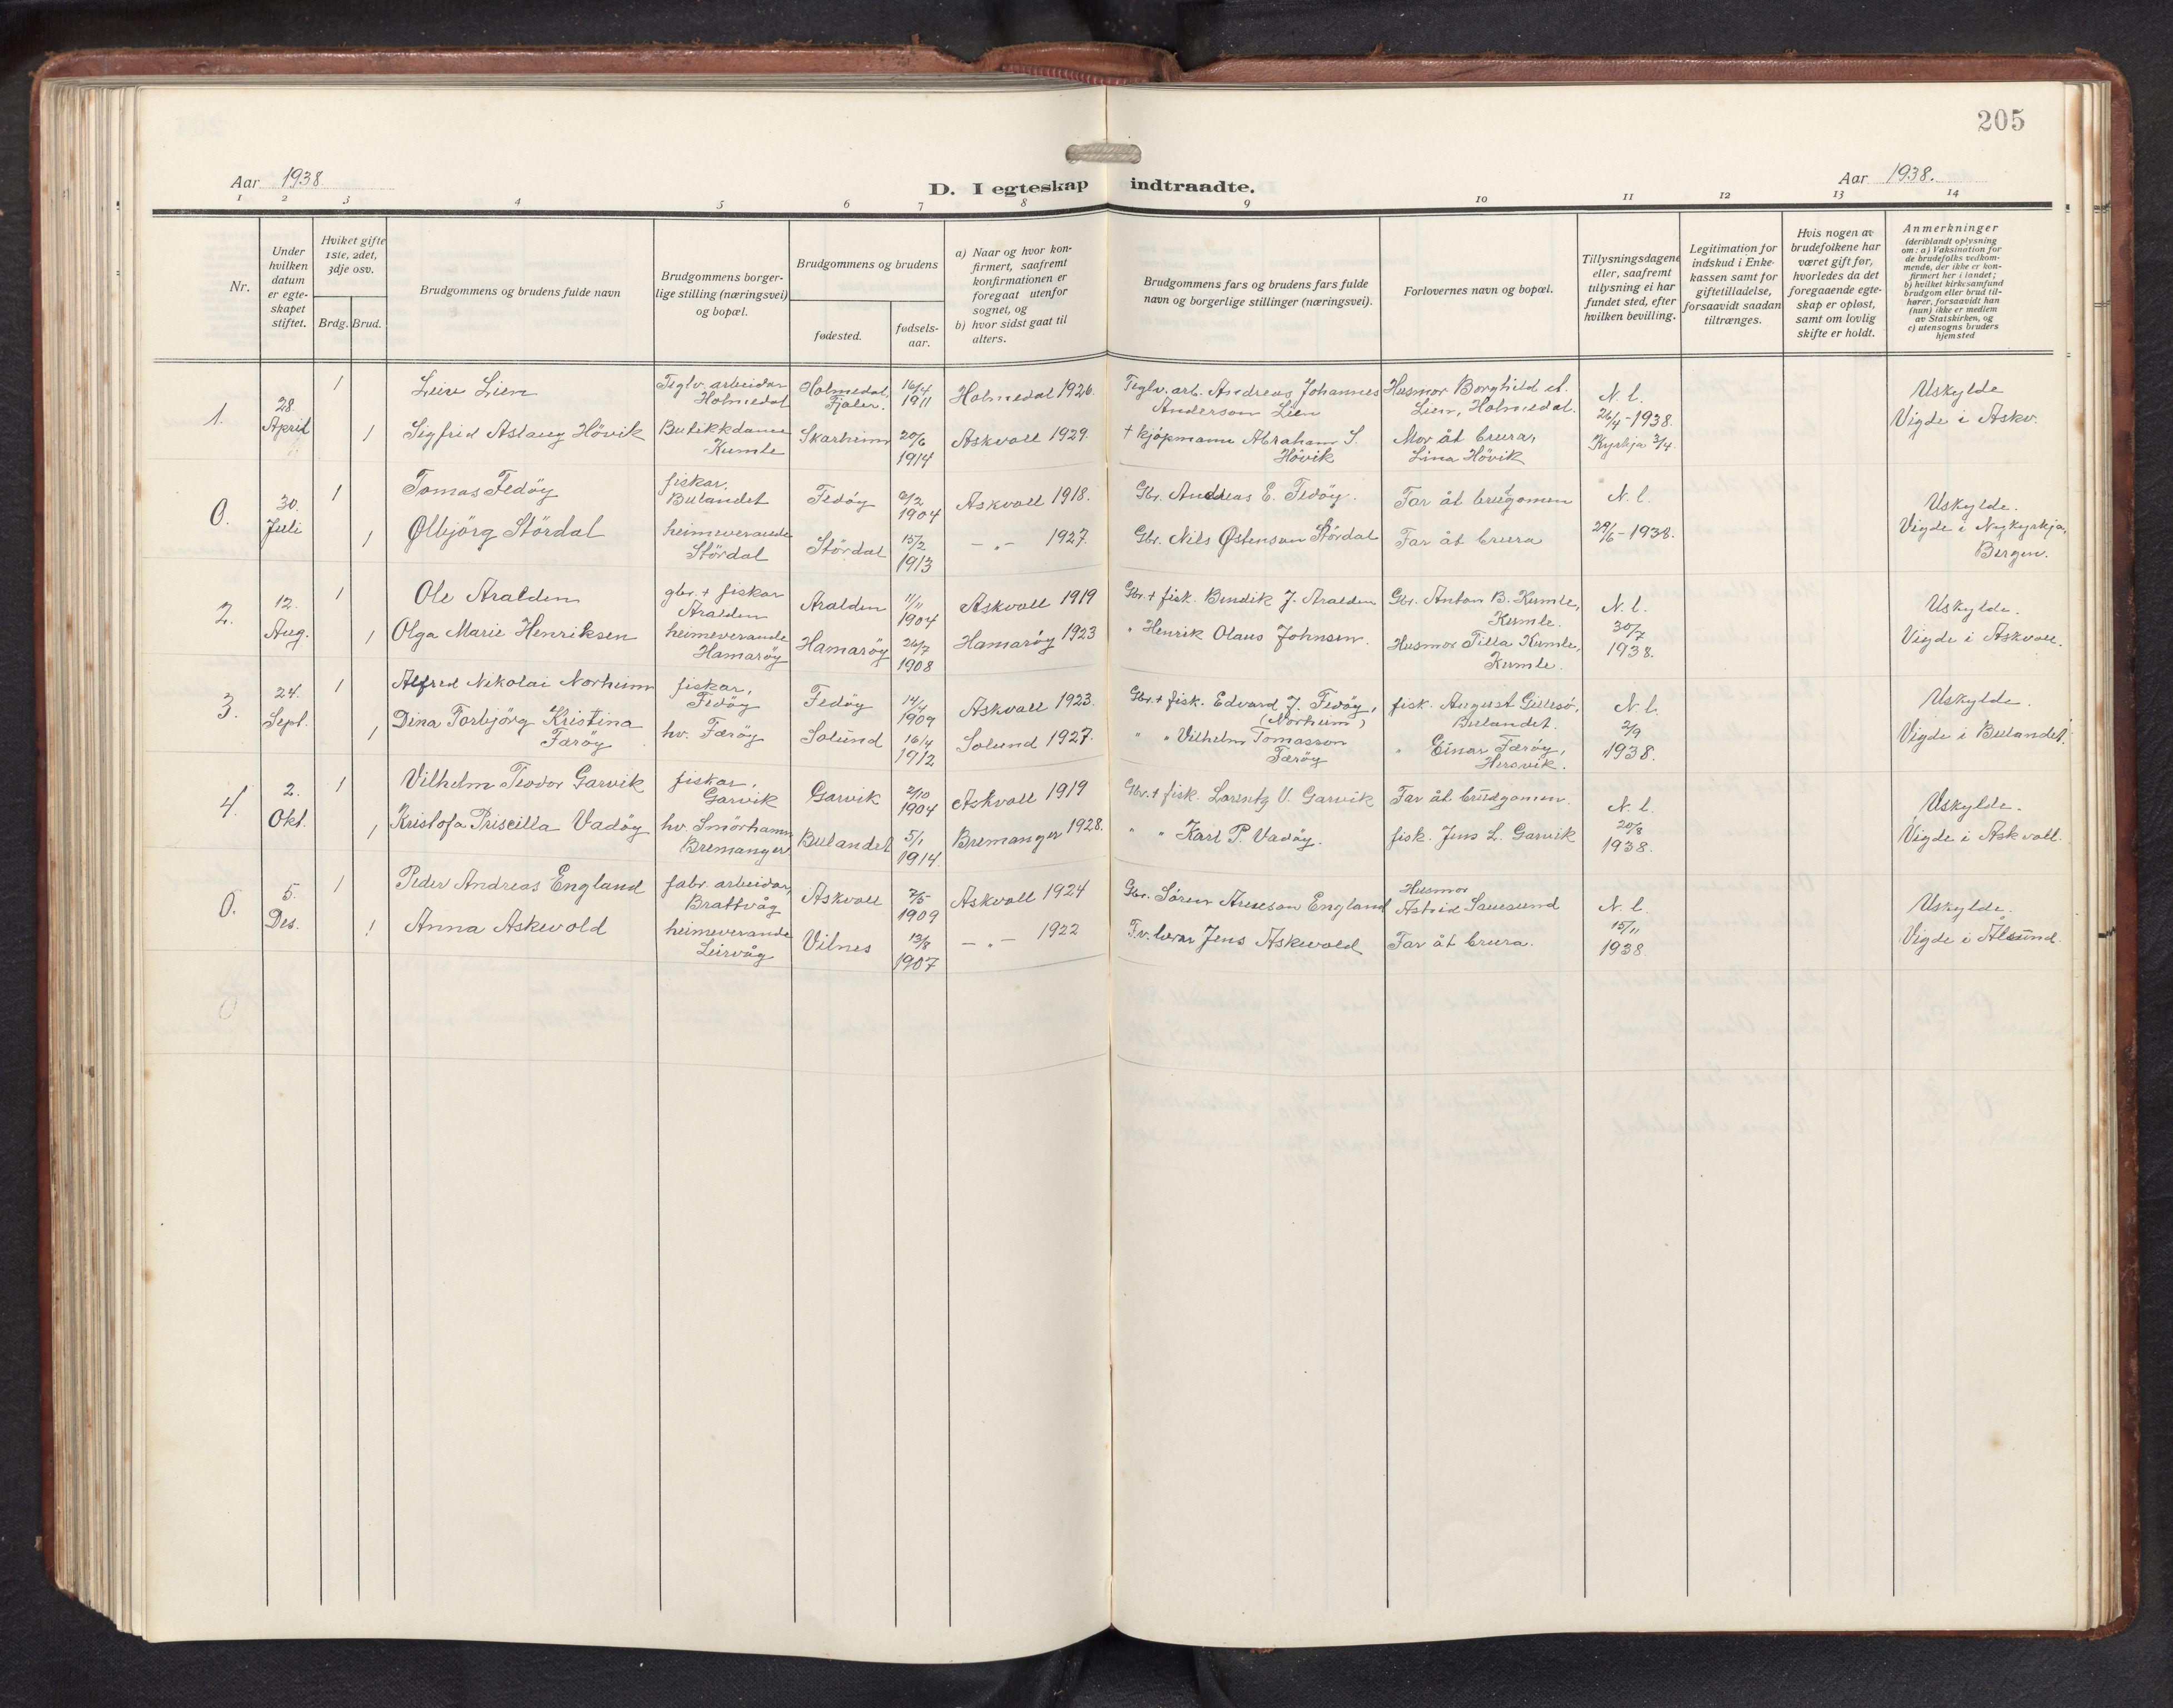 SAB, Askvoll sokneprestembete, H/Hab/Habb/L0002: Klokkerbok nr. B 2, 1910-1947, s. 204b-205a